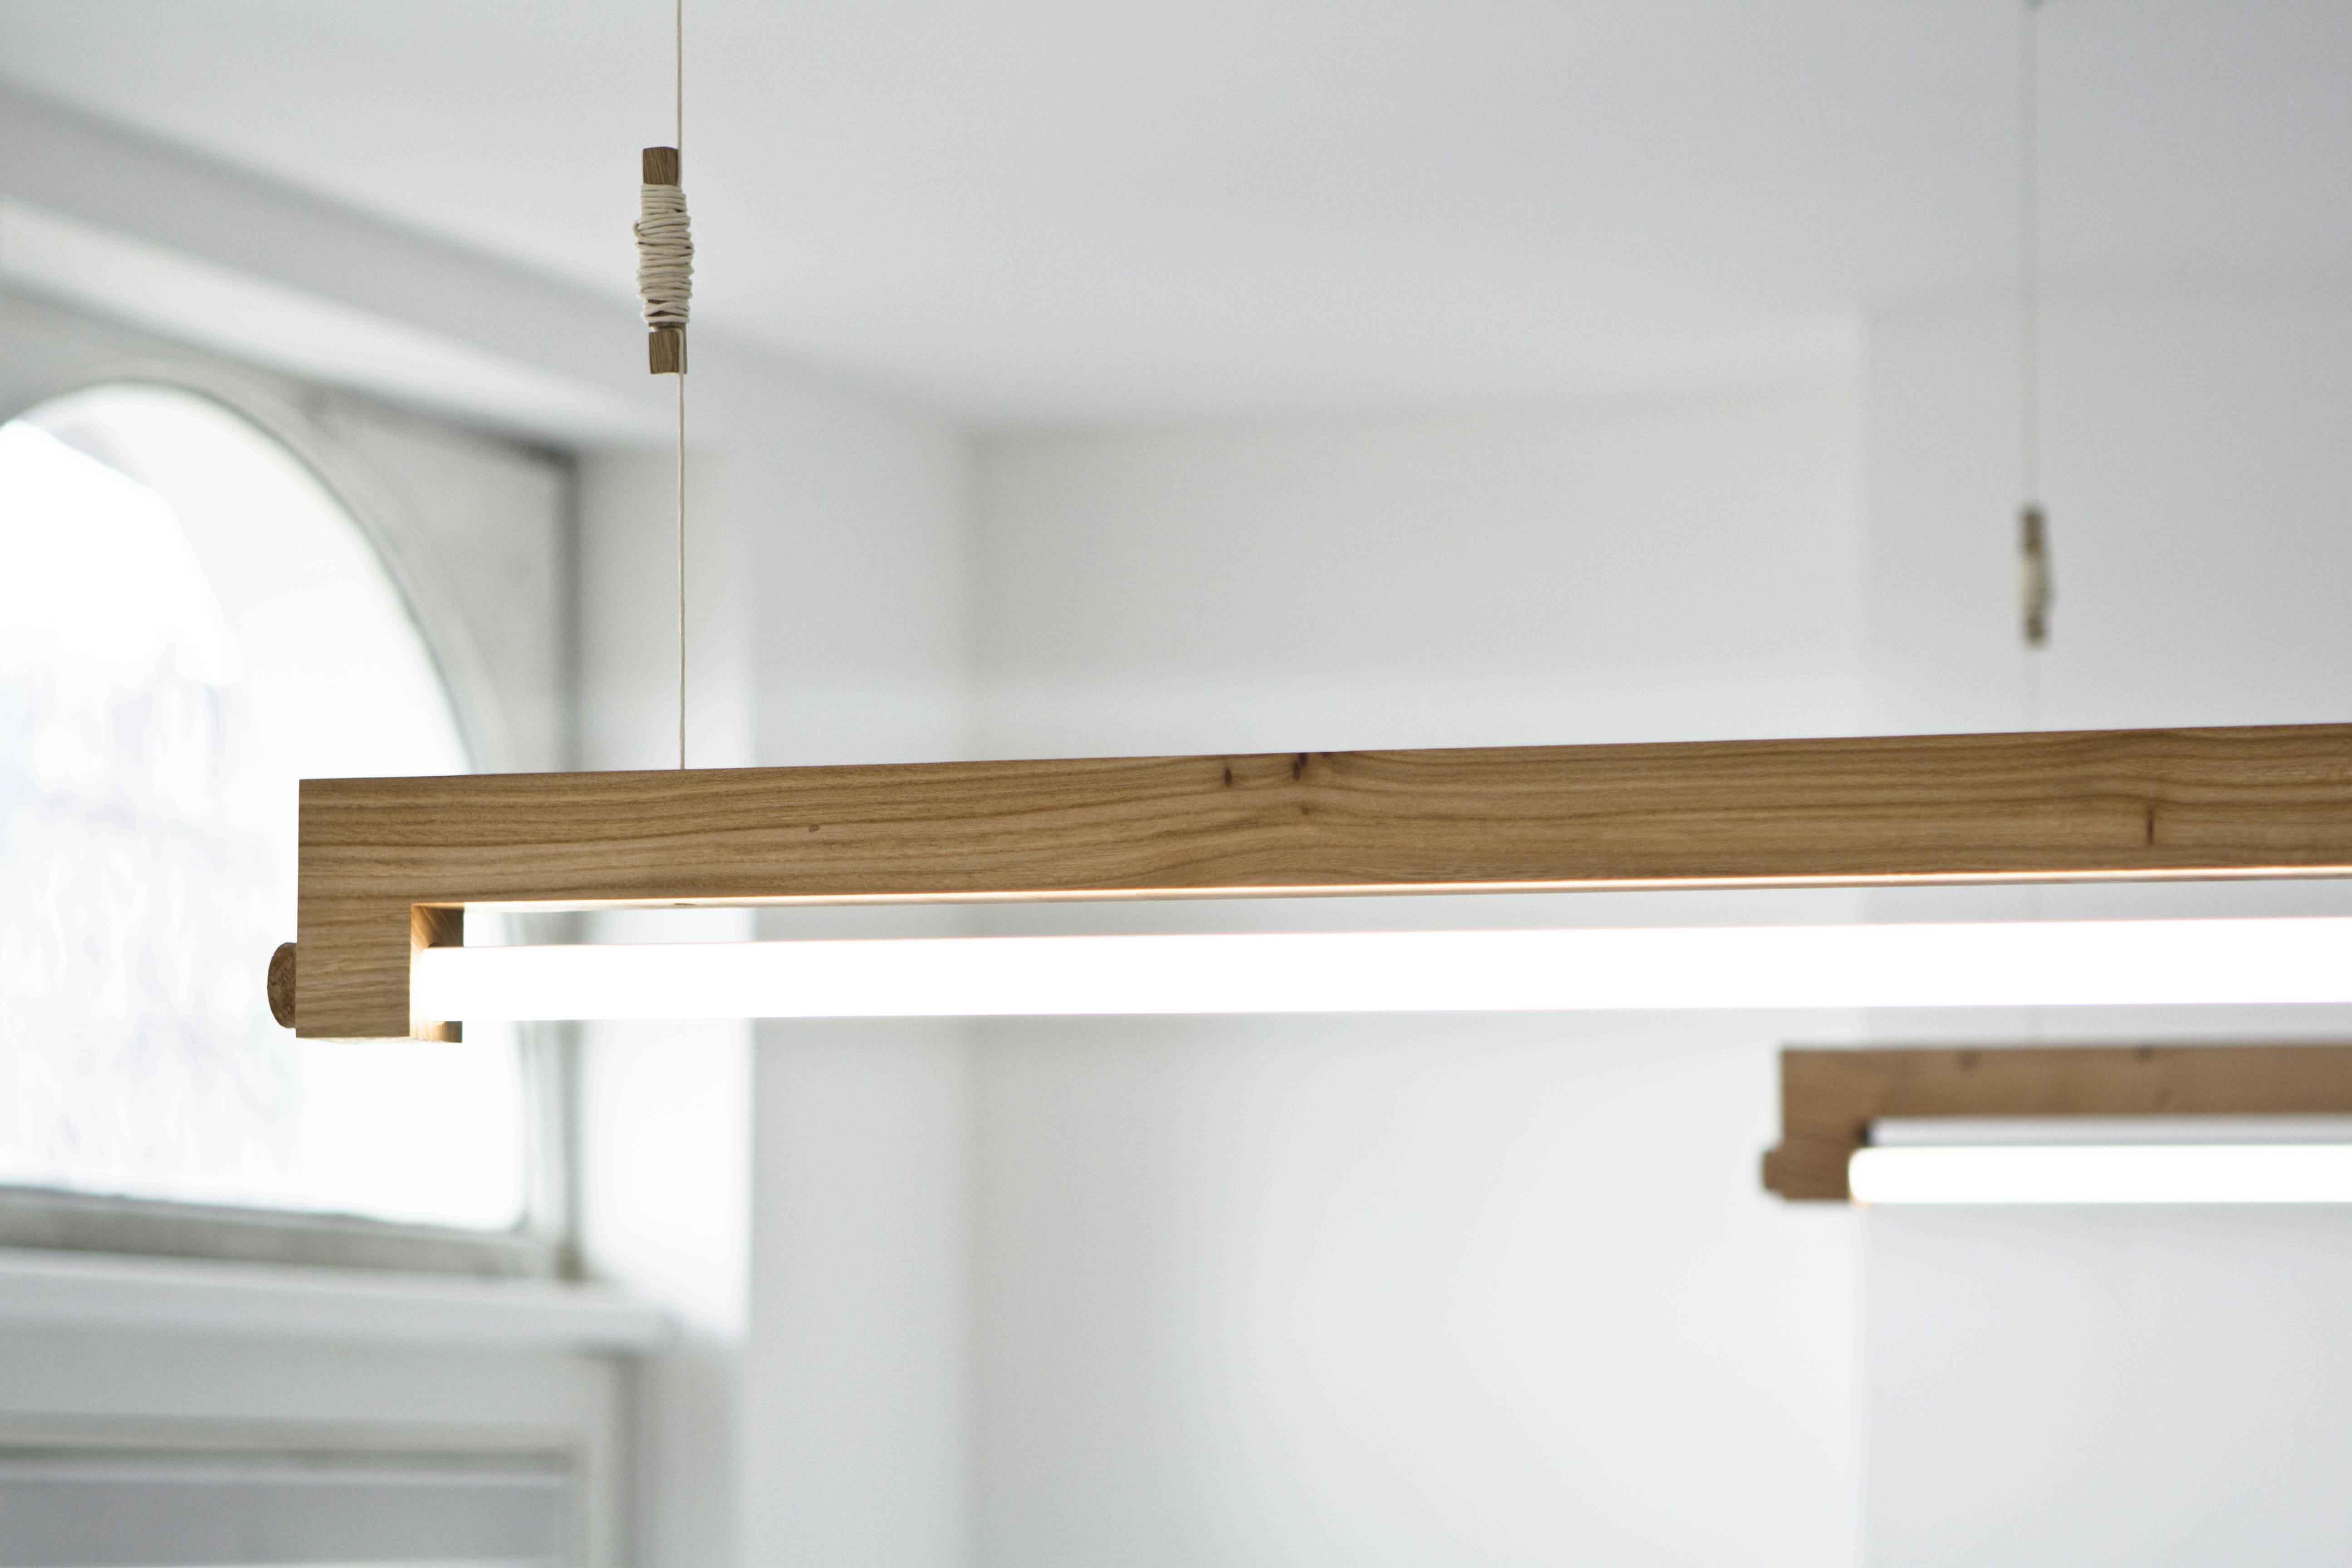 Minimalistische led tl lamp ninebyfour van waarmakers i gimmii shop - Indus badkamer ...